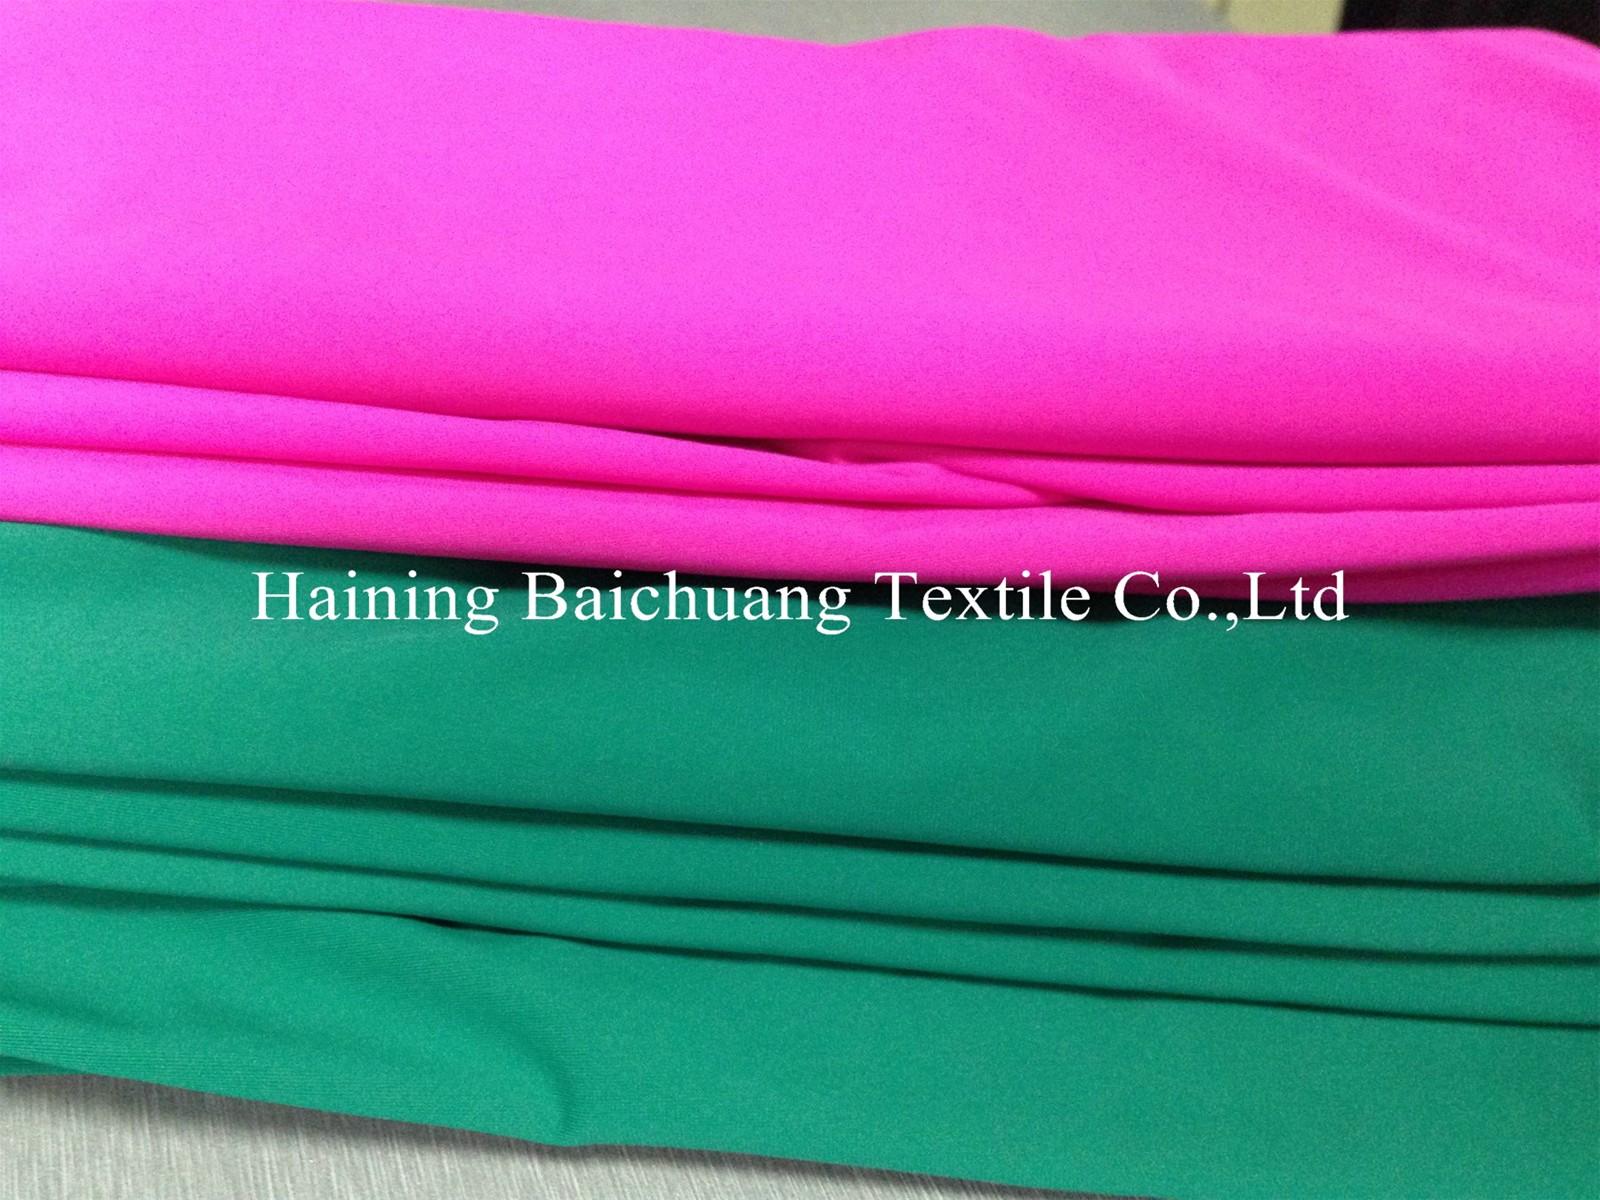 nylon spandex fabricsswimwear fabrics